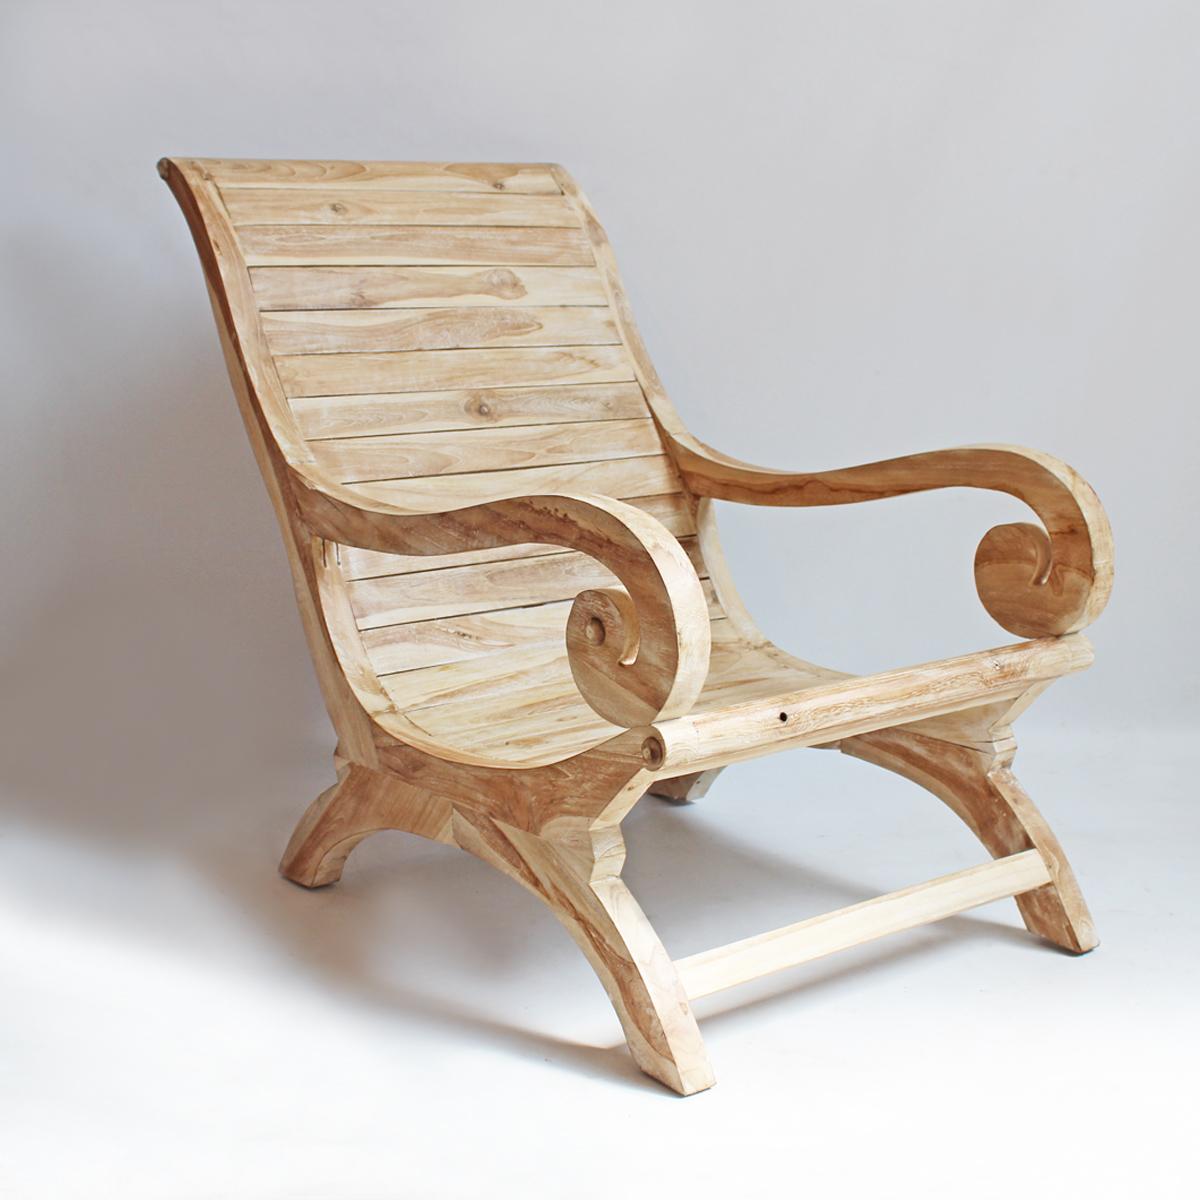 Teak Wood Lounge Chair Furniture  Mix Furniture